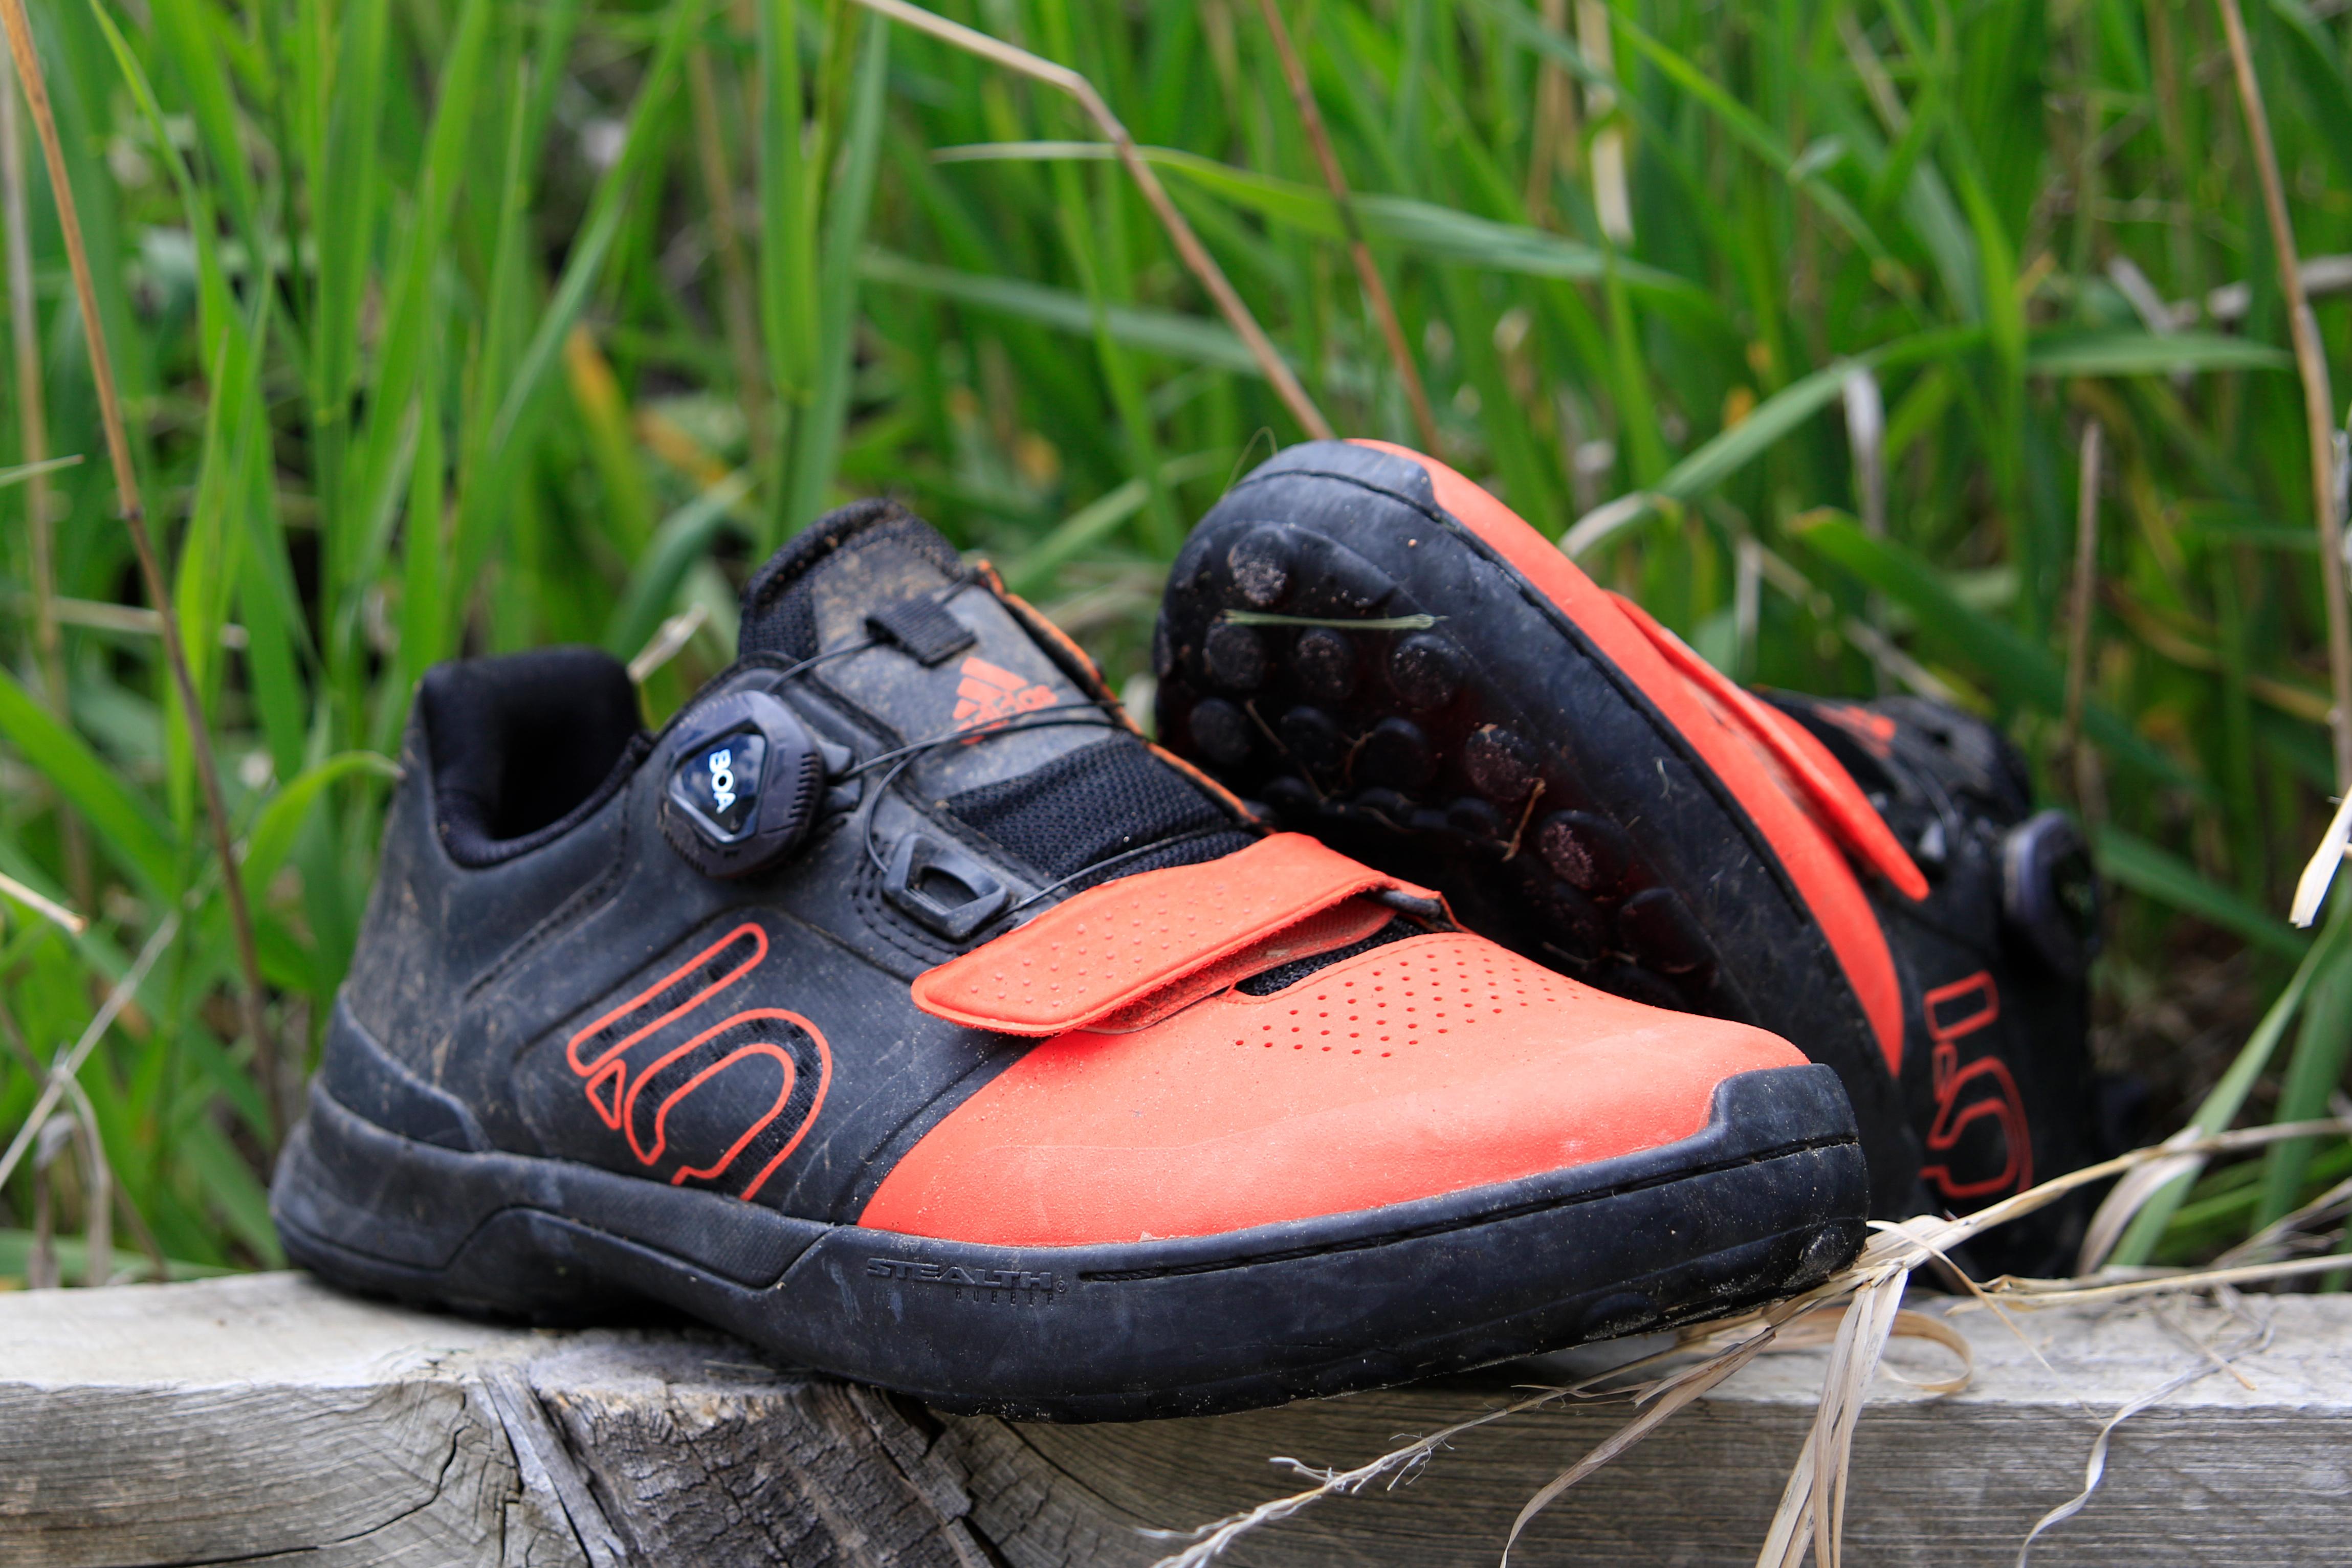 descubre las últimas tendencias diseño novedoso completo en especificaciones Review: Five Ten Kestrel Pro Boa MTB Shoes Are Clipless Flats -  Singletracks Mountain Bike News